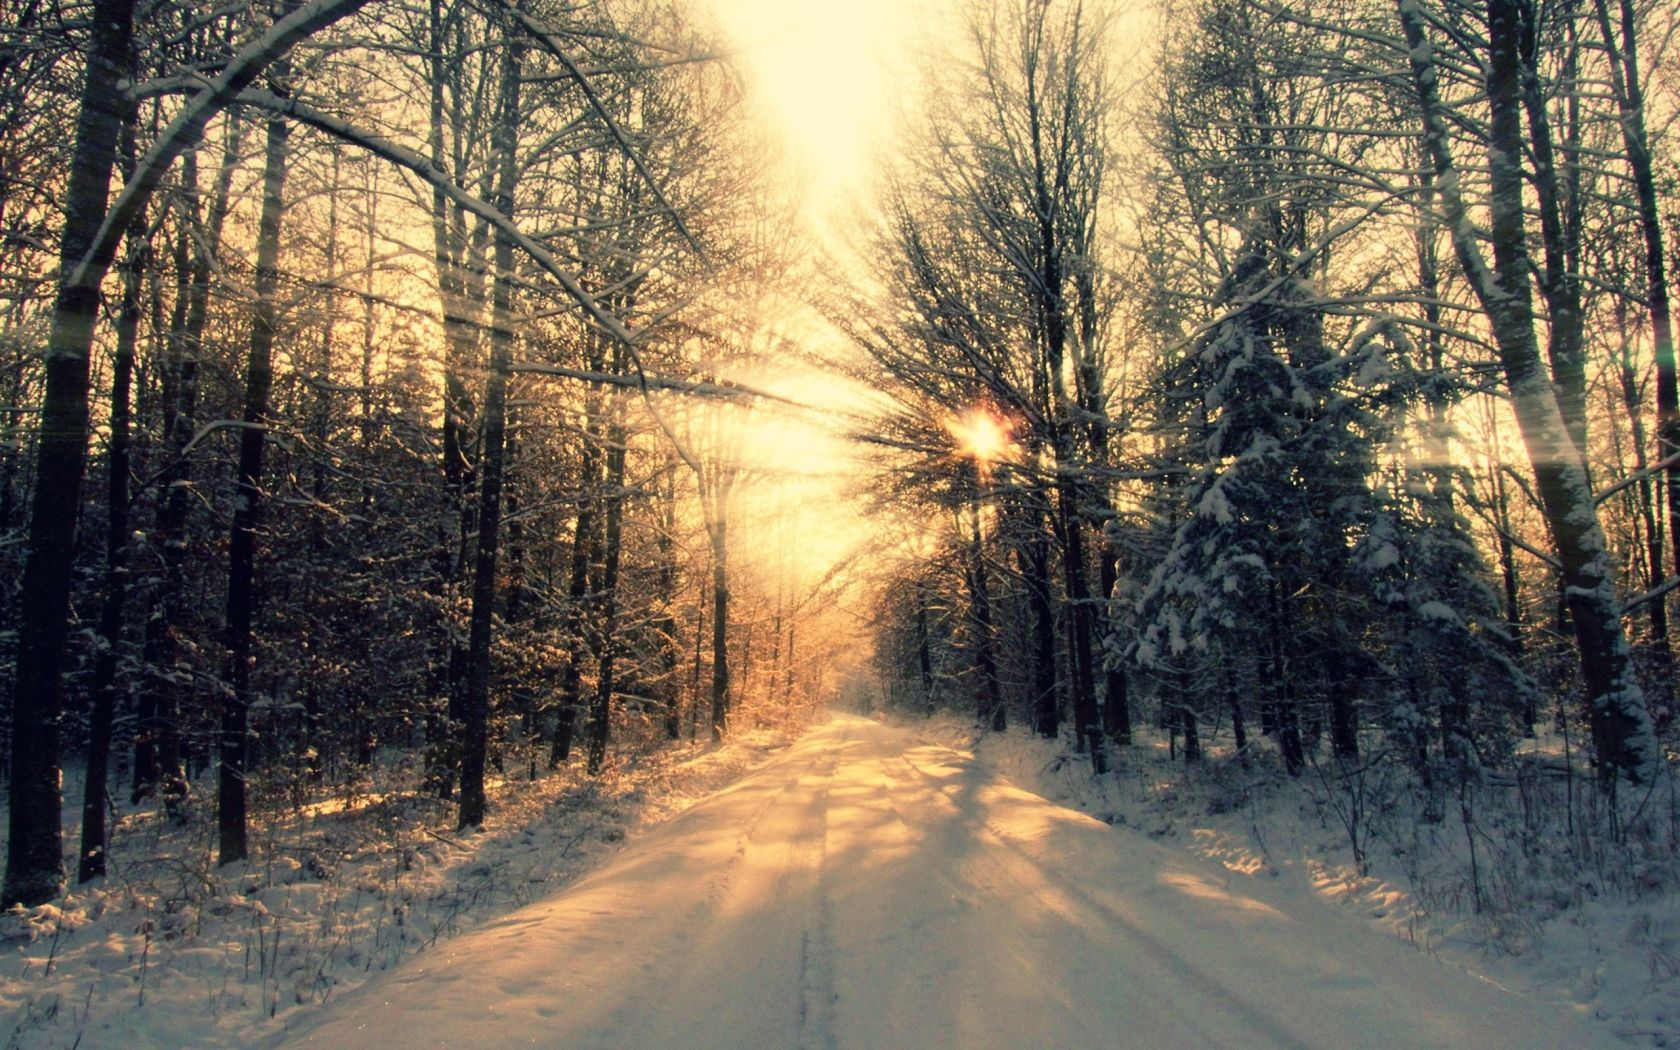 Winter wallpaper tumblr snow time pinterest winter - Winter tumblr wallpaper ...